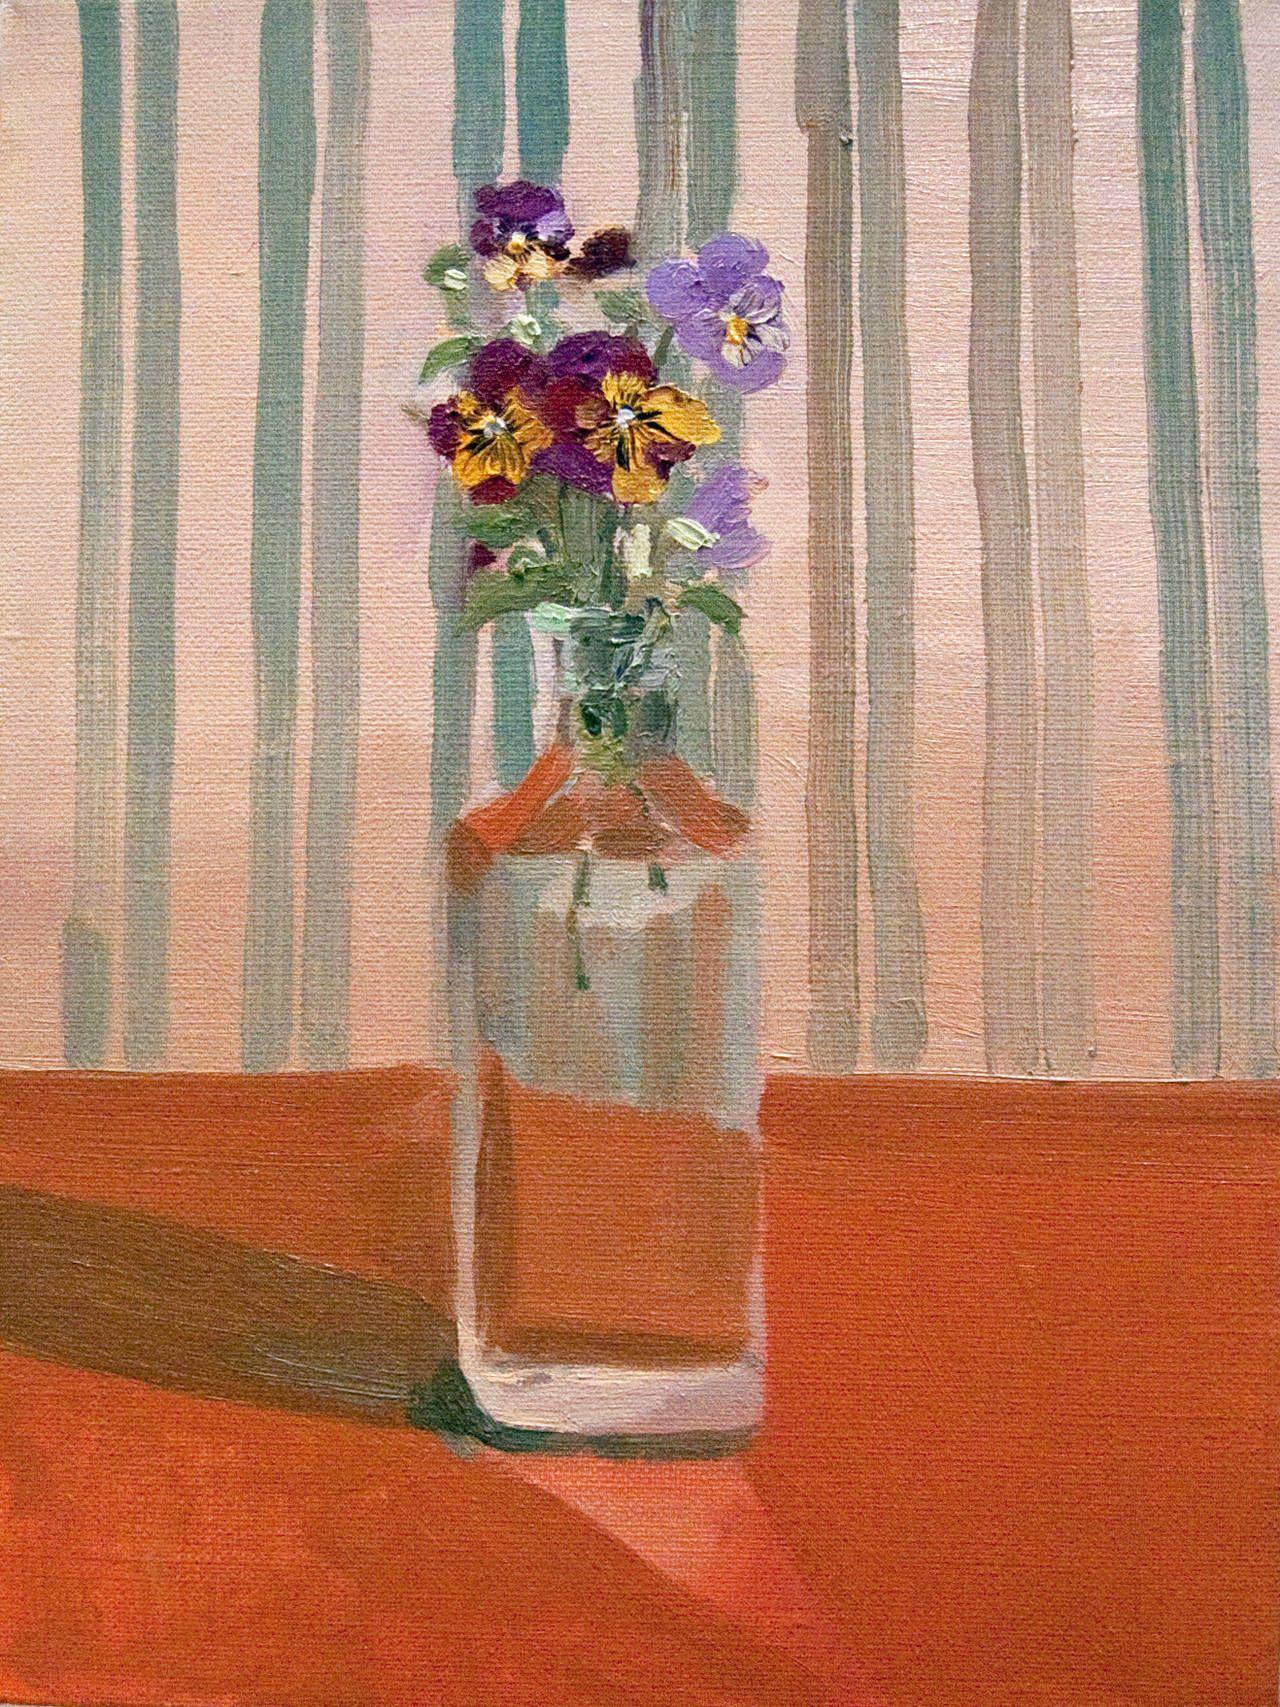 Susan Homer - Pansies in a Bottle